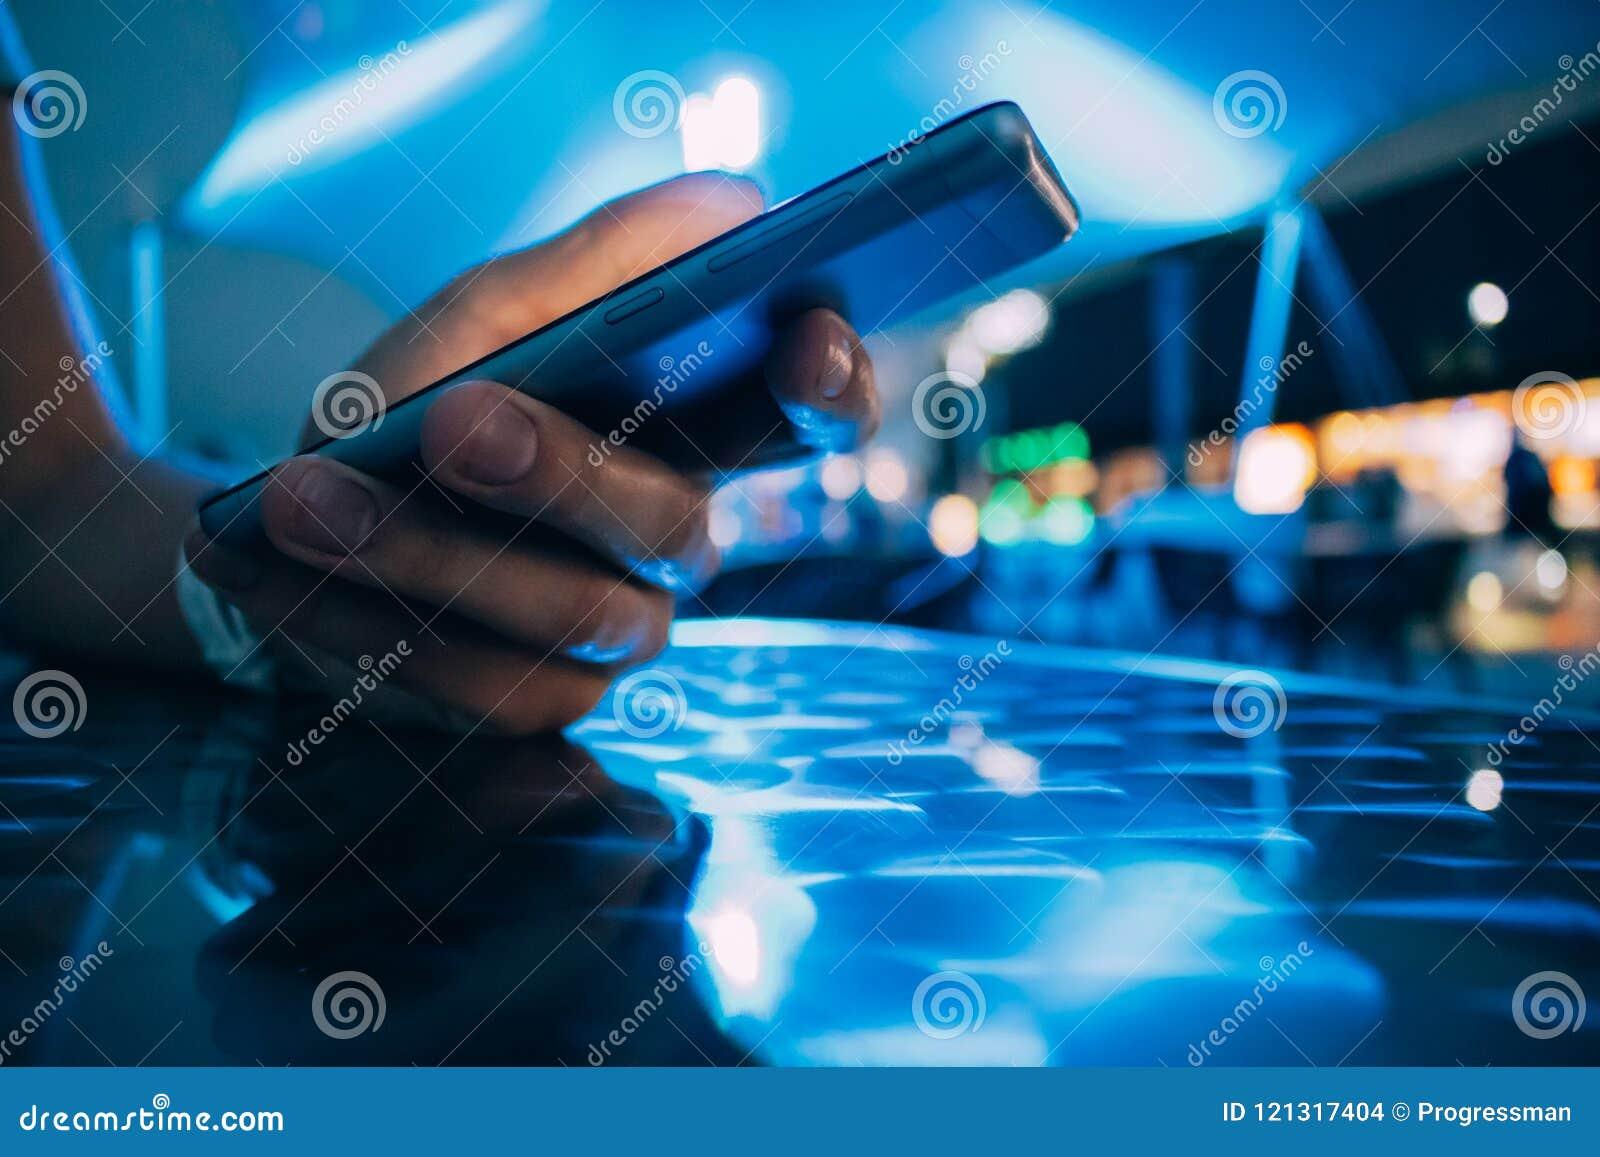 Close-up hand holding smart phone on night bar